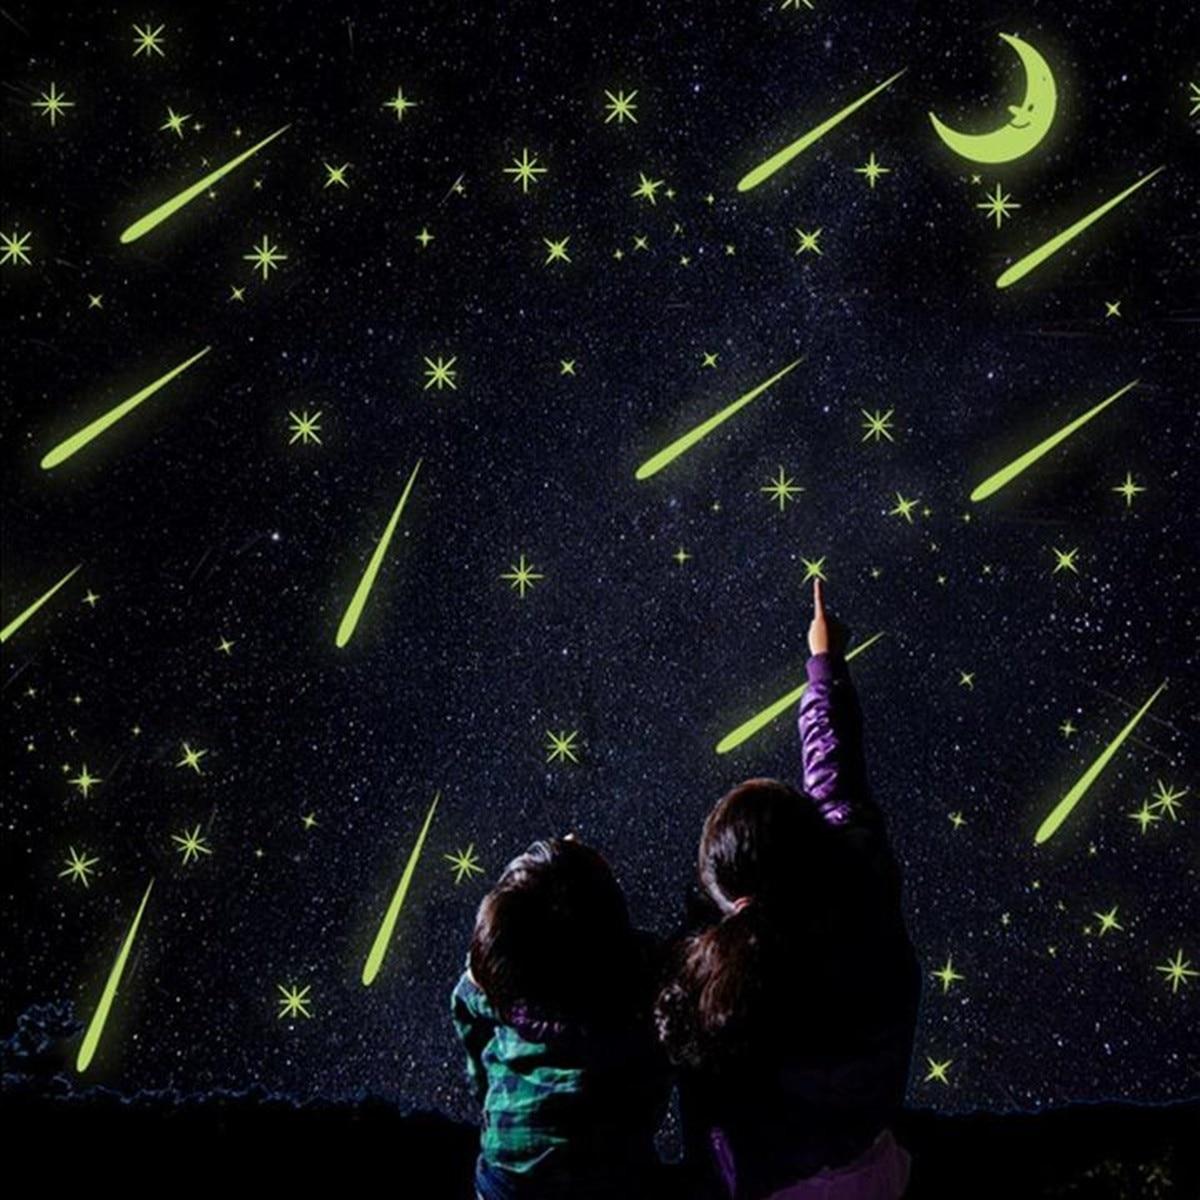 Meteor Shower Luminous Wall Stickers Livingroom Bedroom TV Wall Home Decor